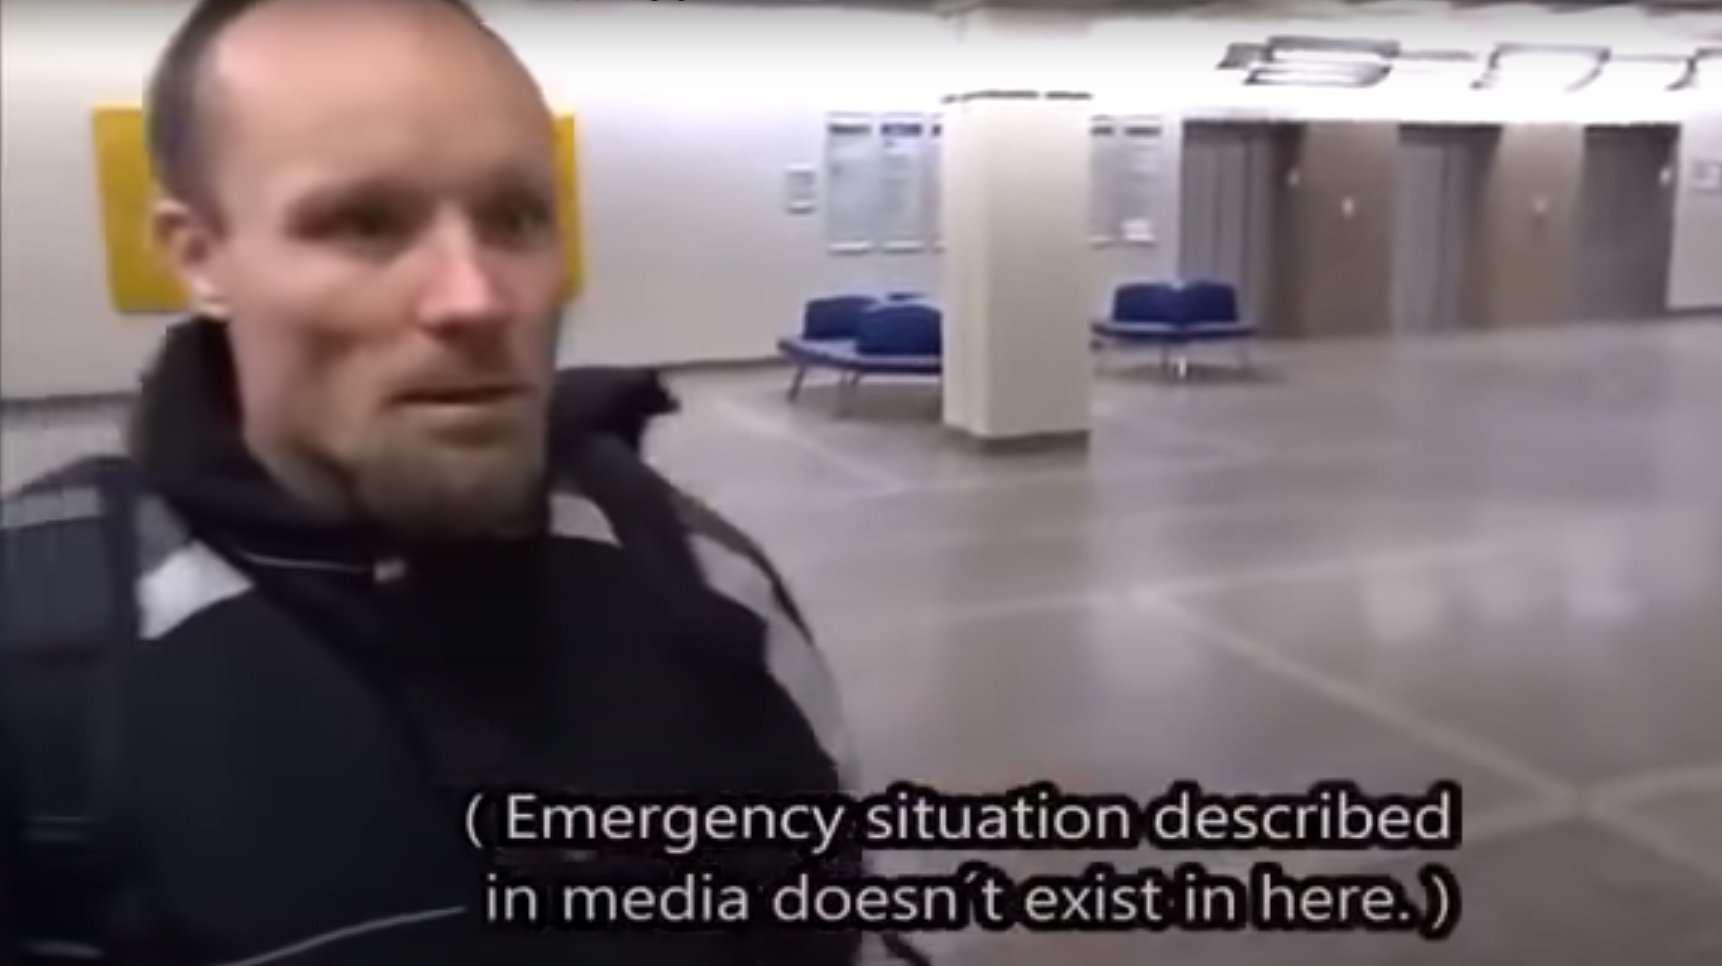 Puste Szpitale W Niemczech